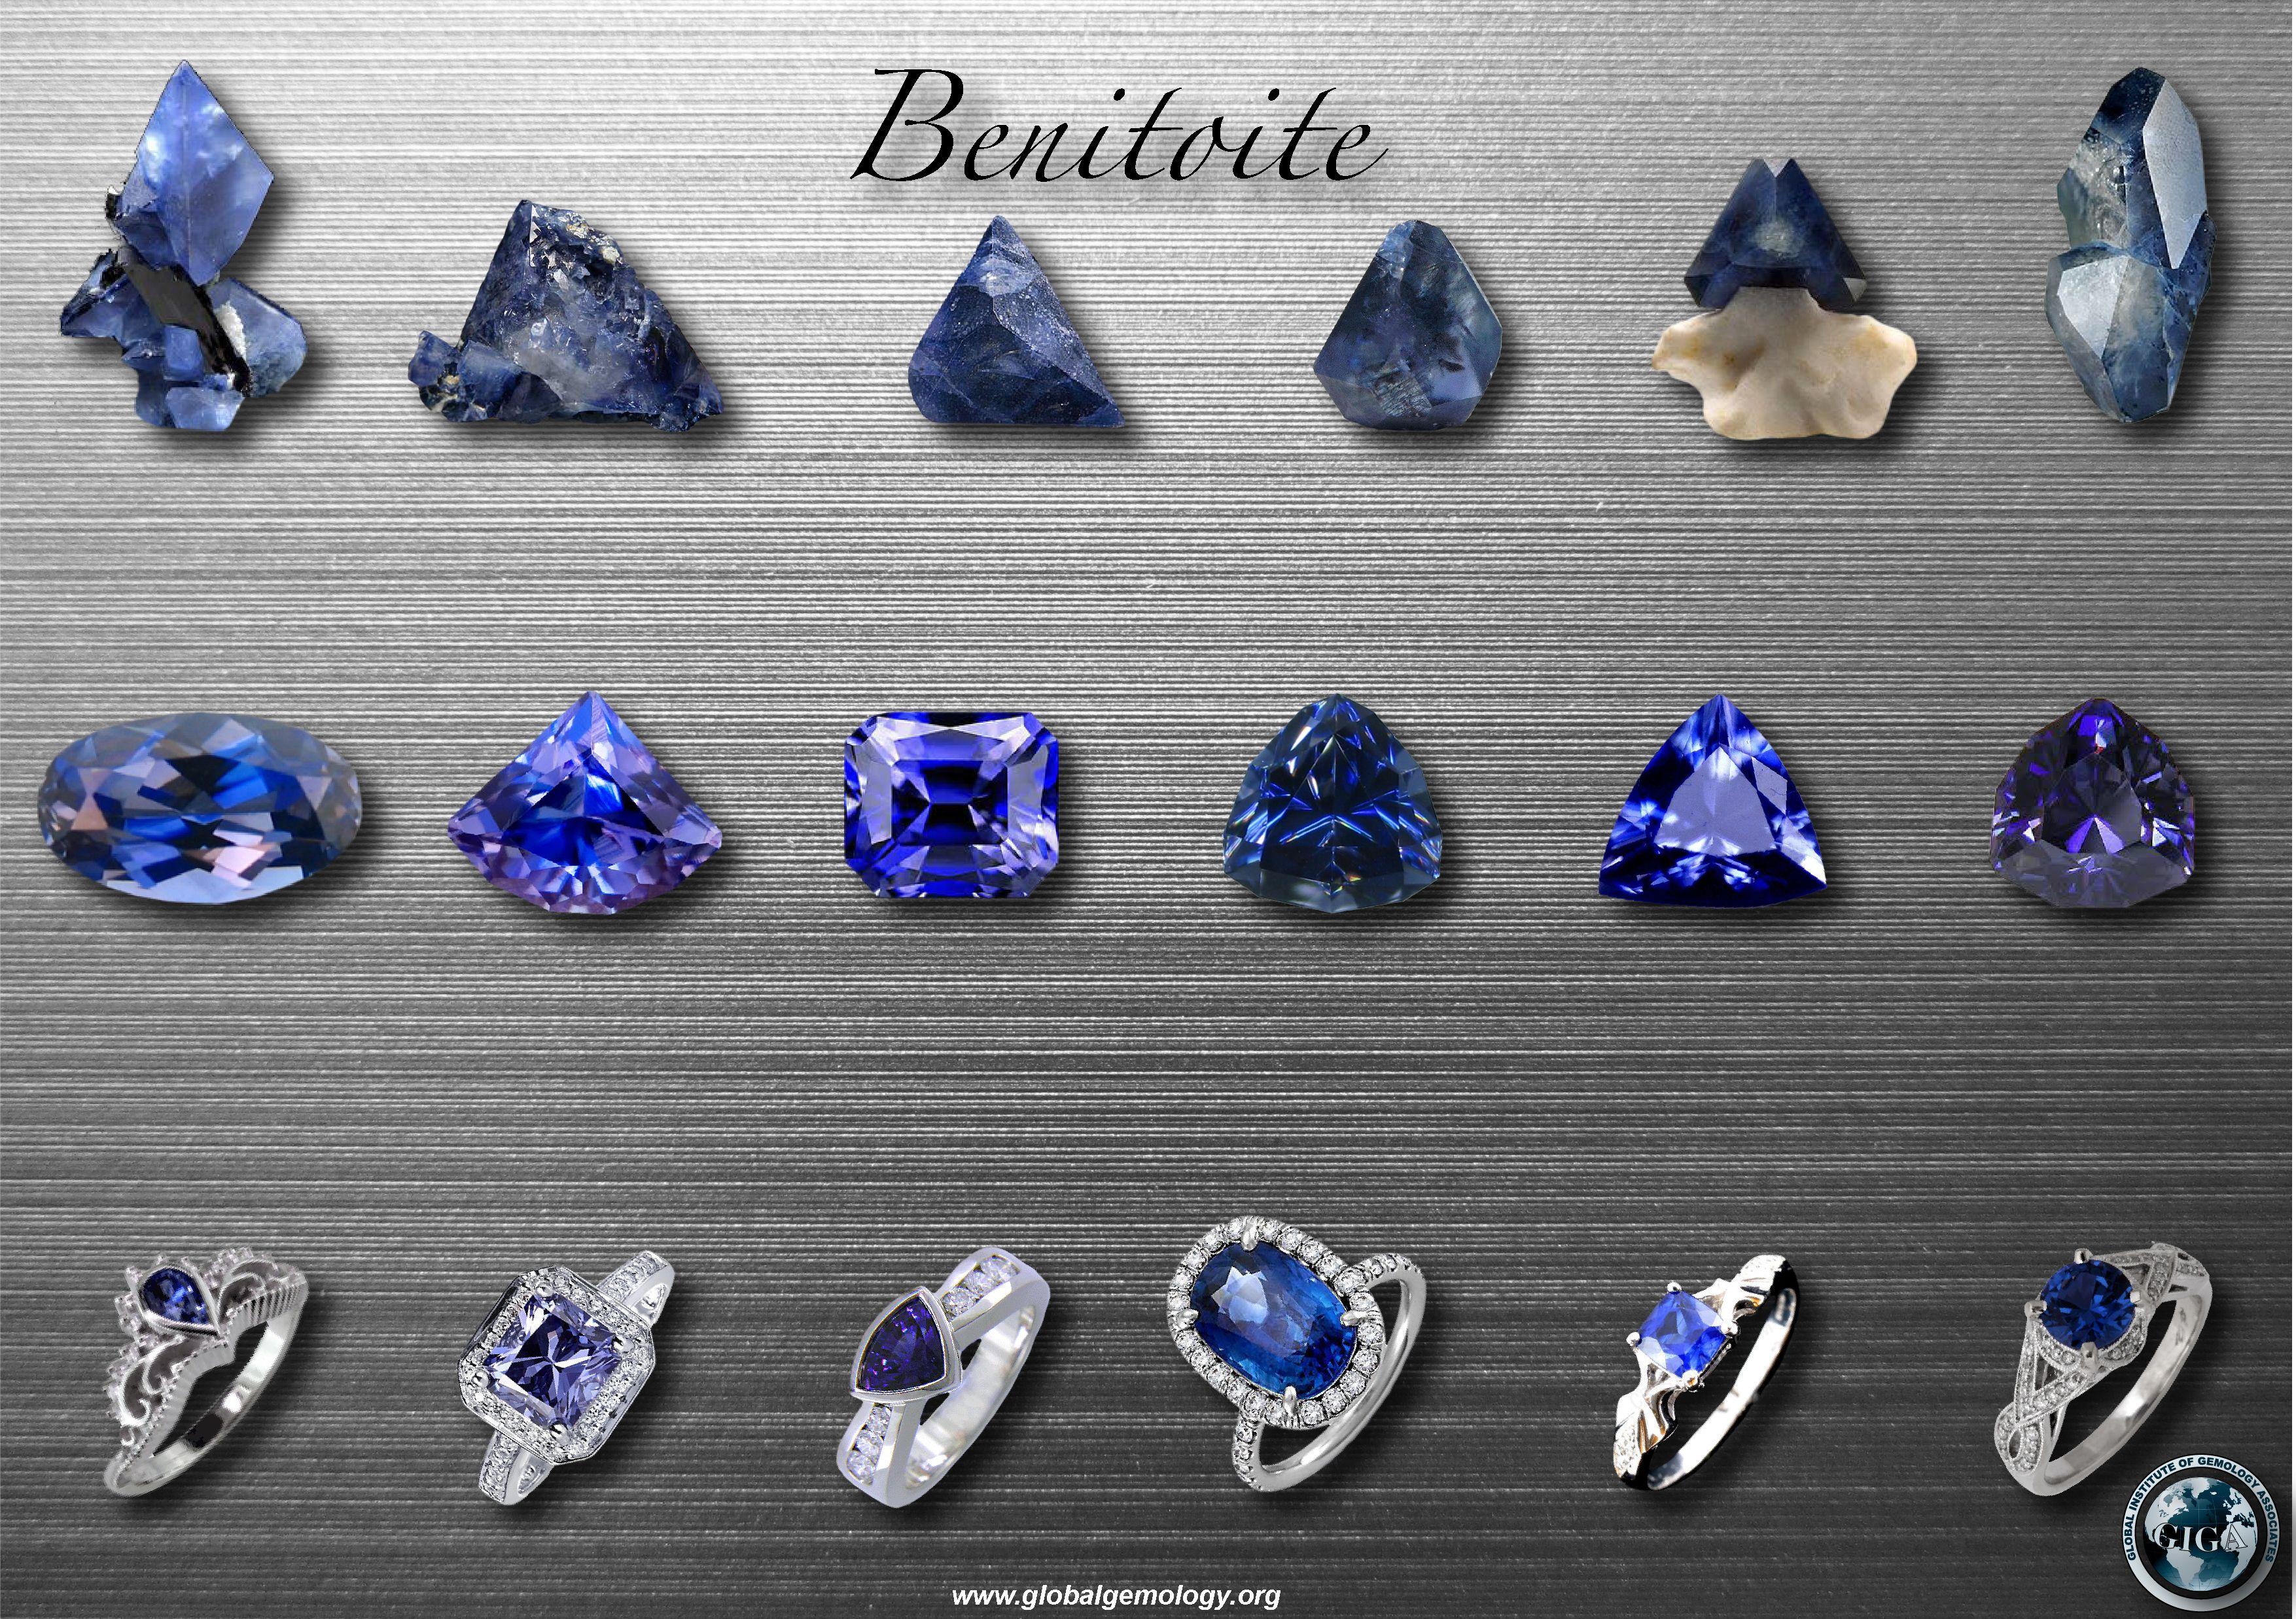 Pin by Marlene Smith on  Rocks and Gems   Rare gems